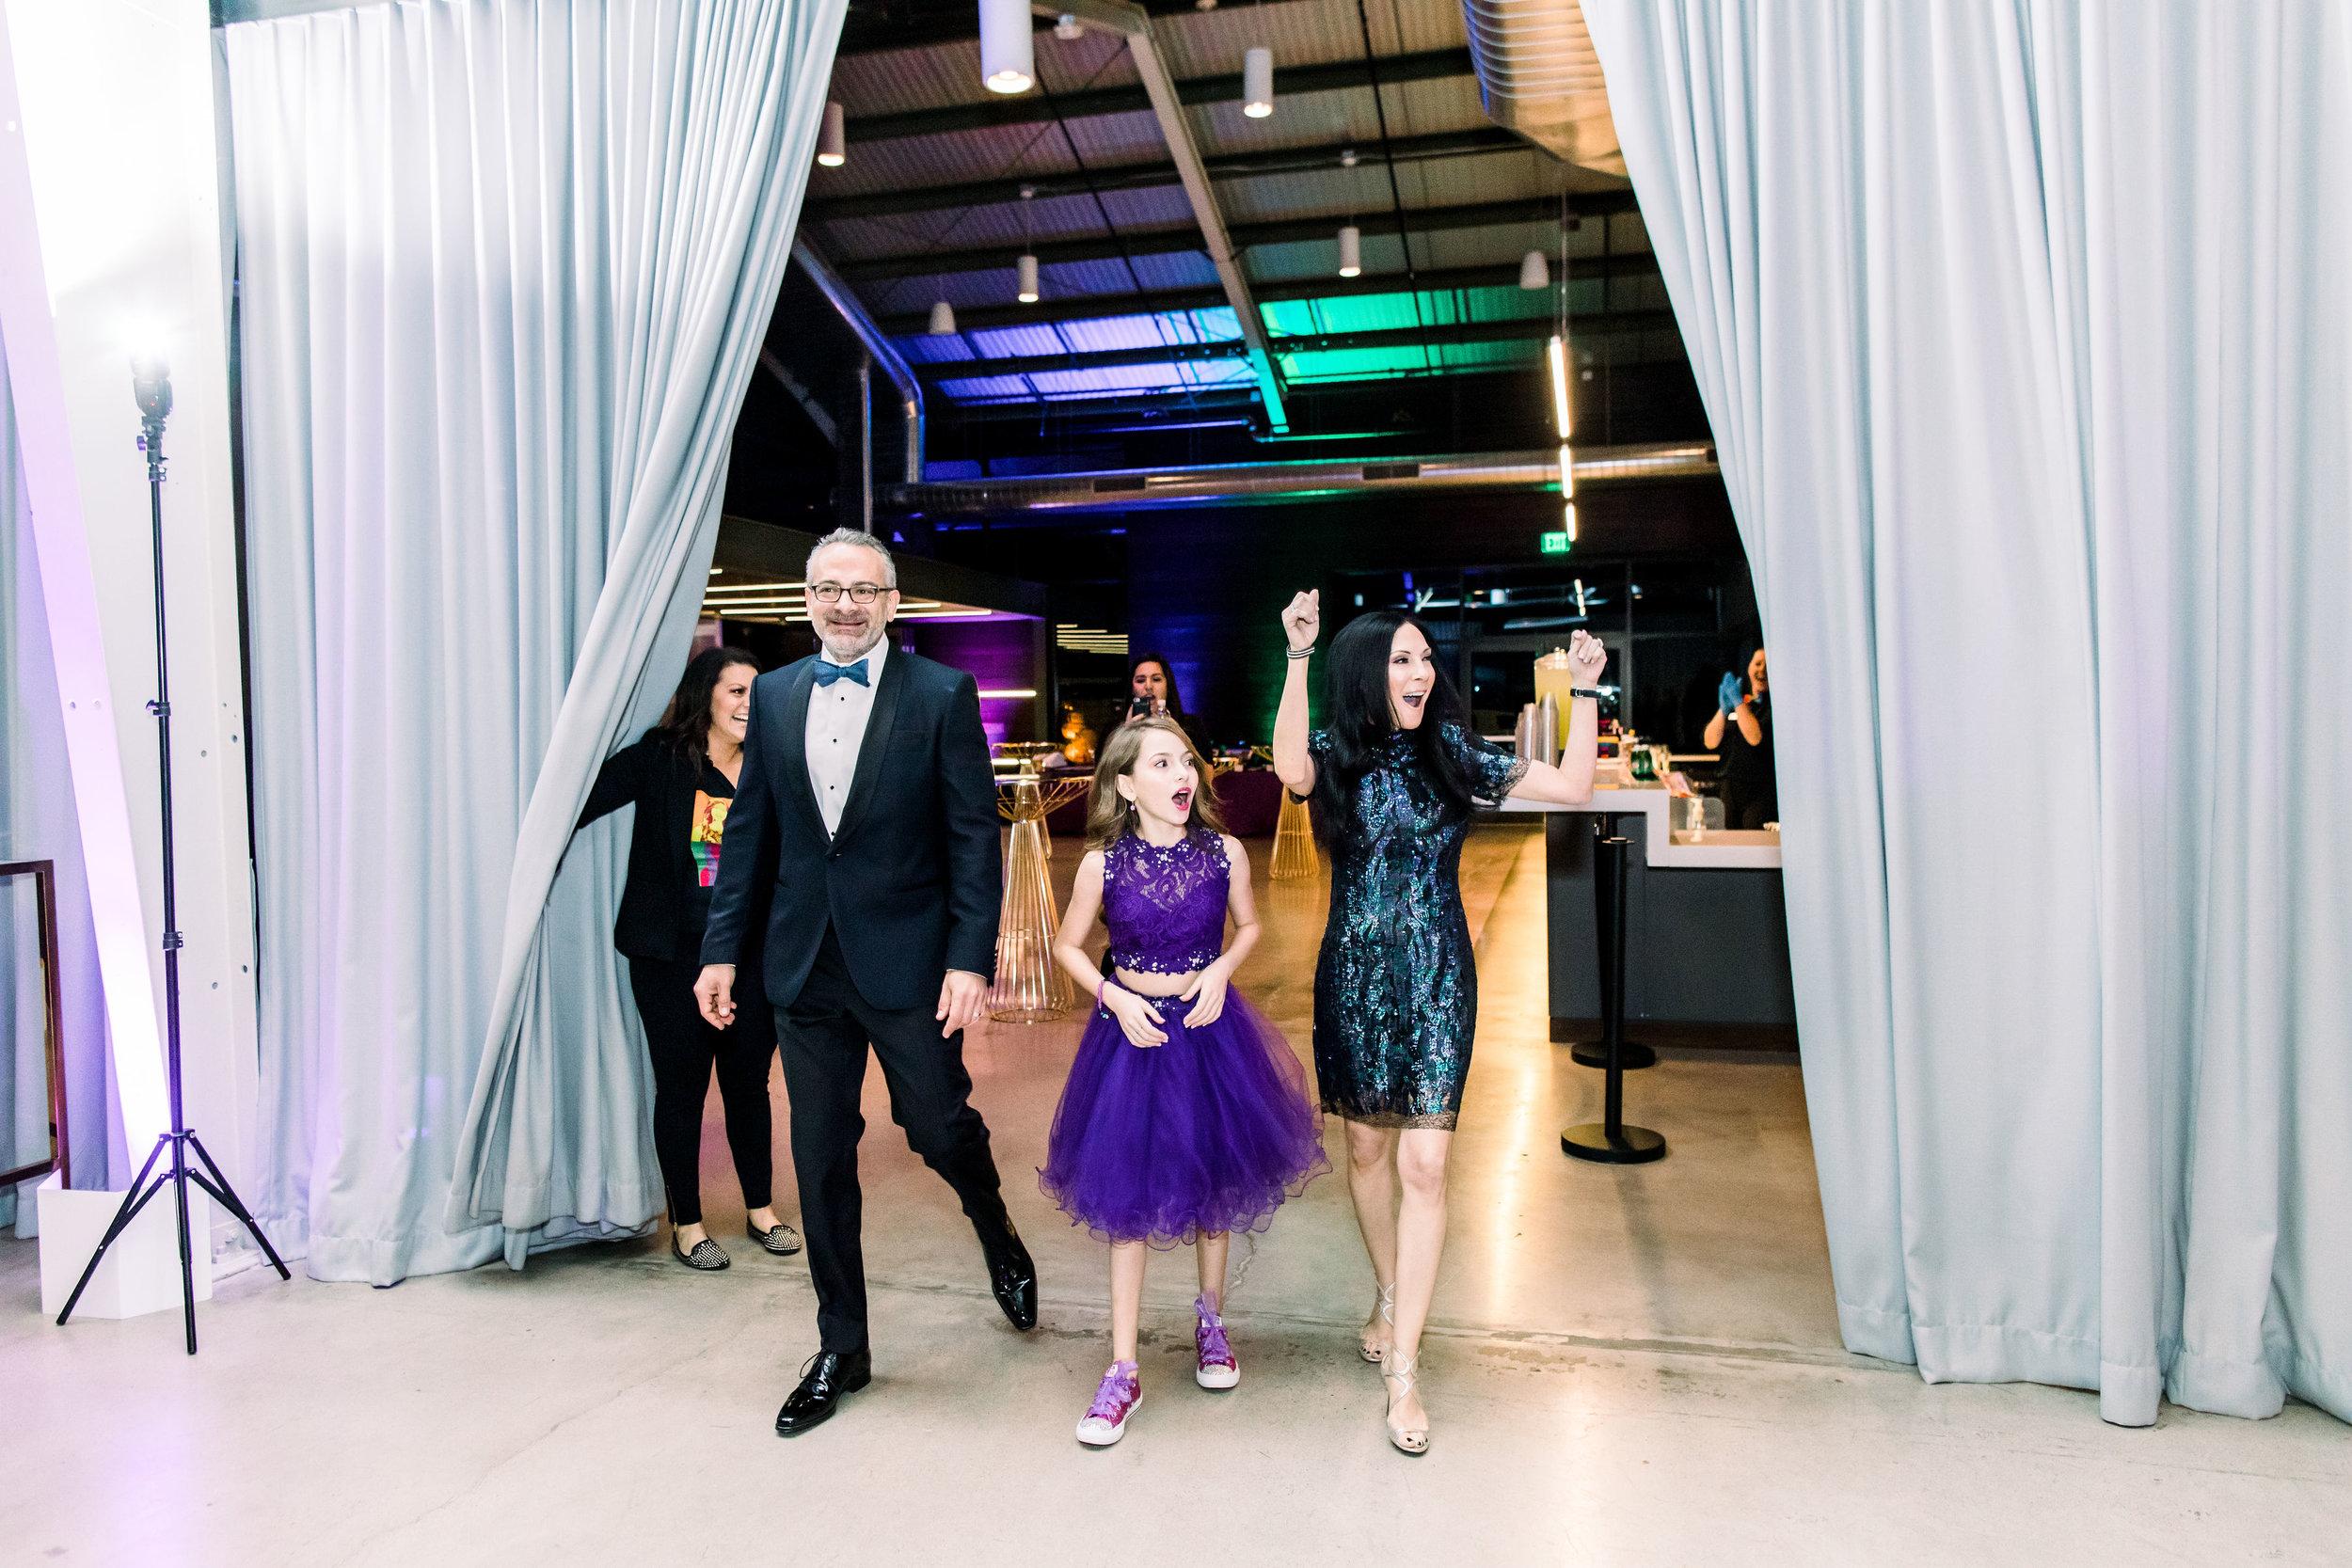 20 rainbow bat mitzvah big reveal surprise bat mitzvah party reception room Life Design Events photos by Stephanie Heymann Photography.jpg